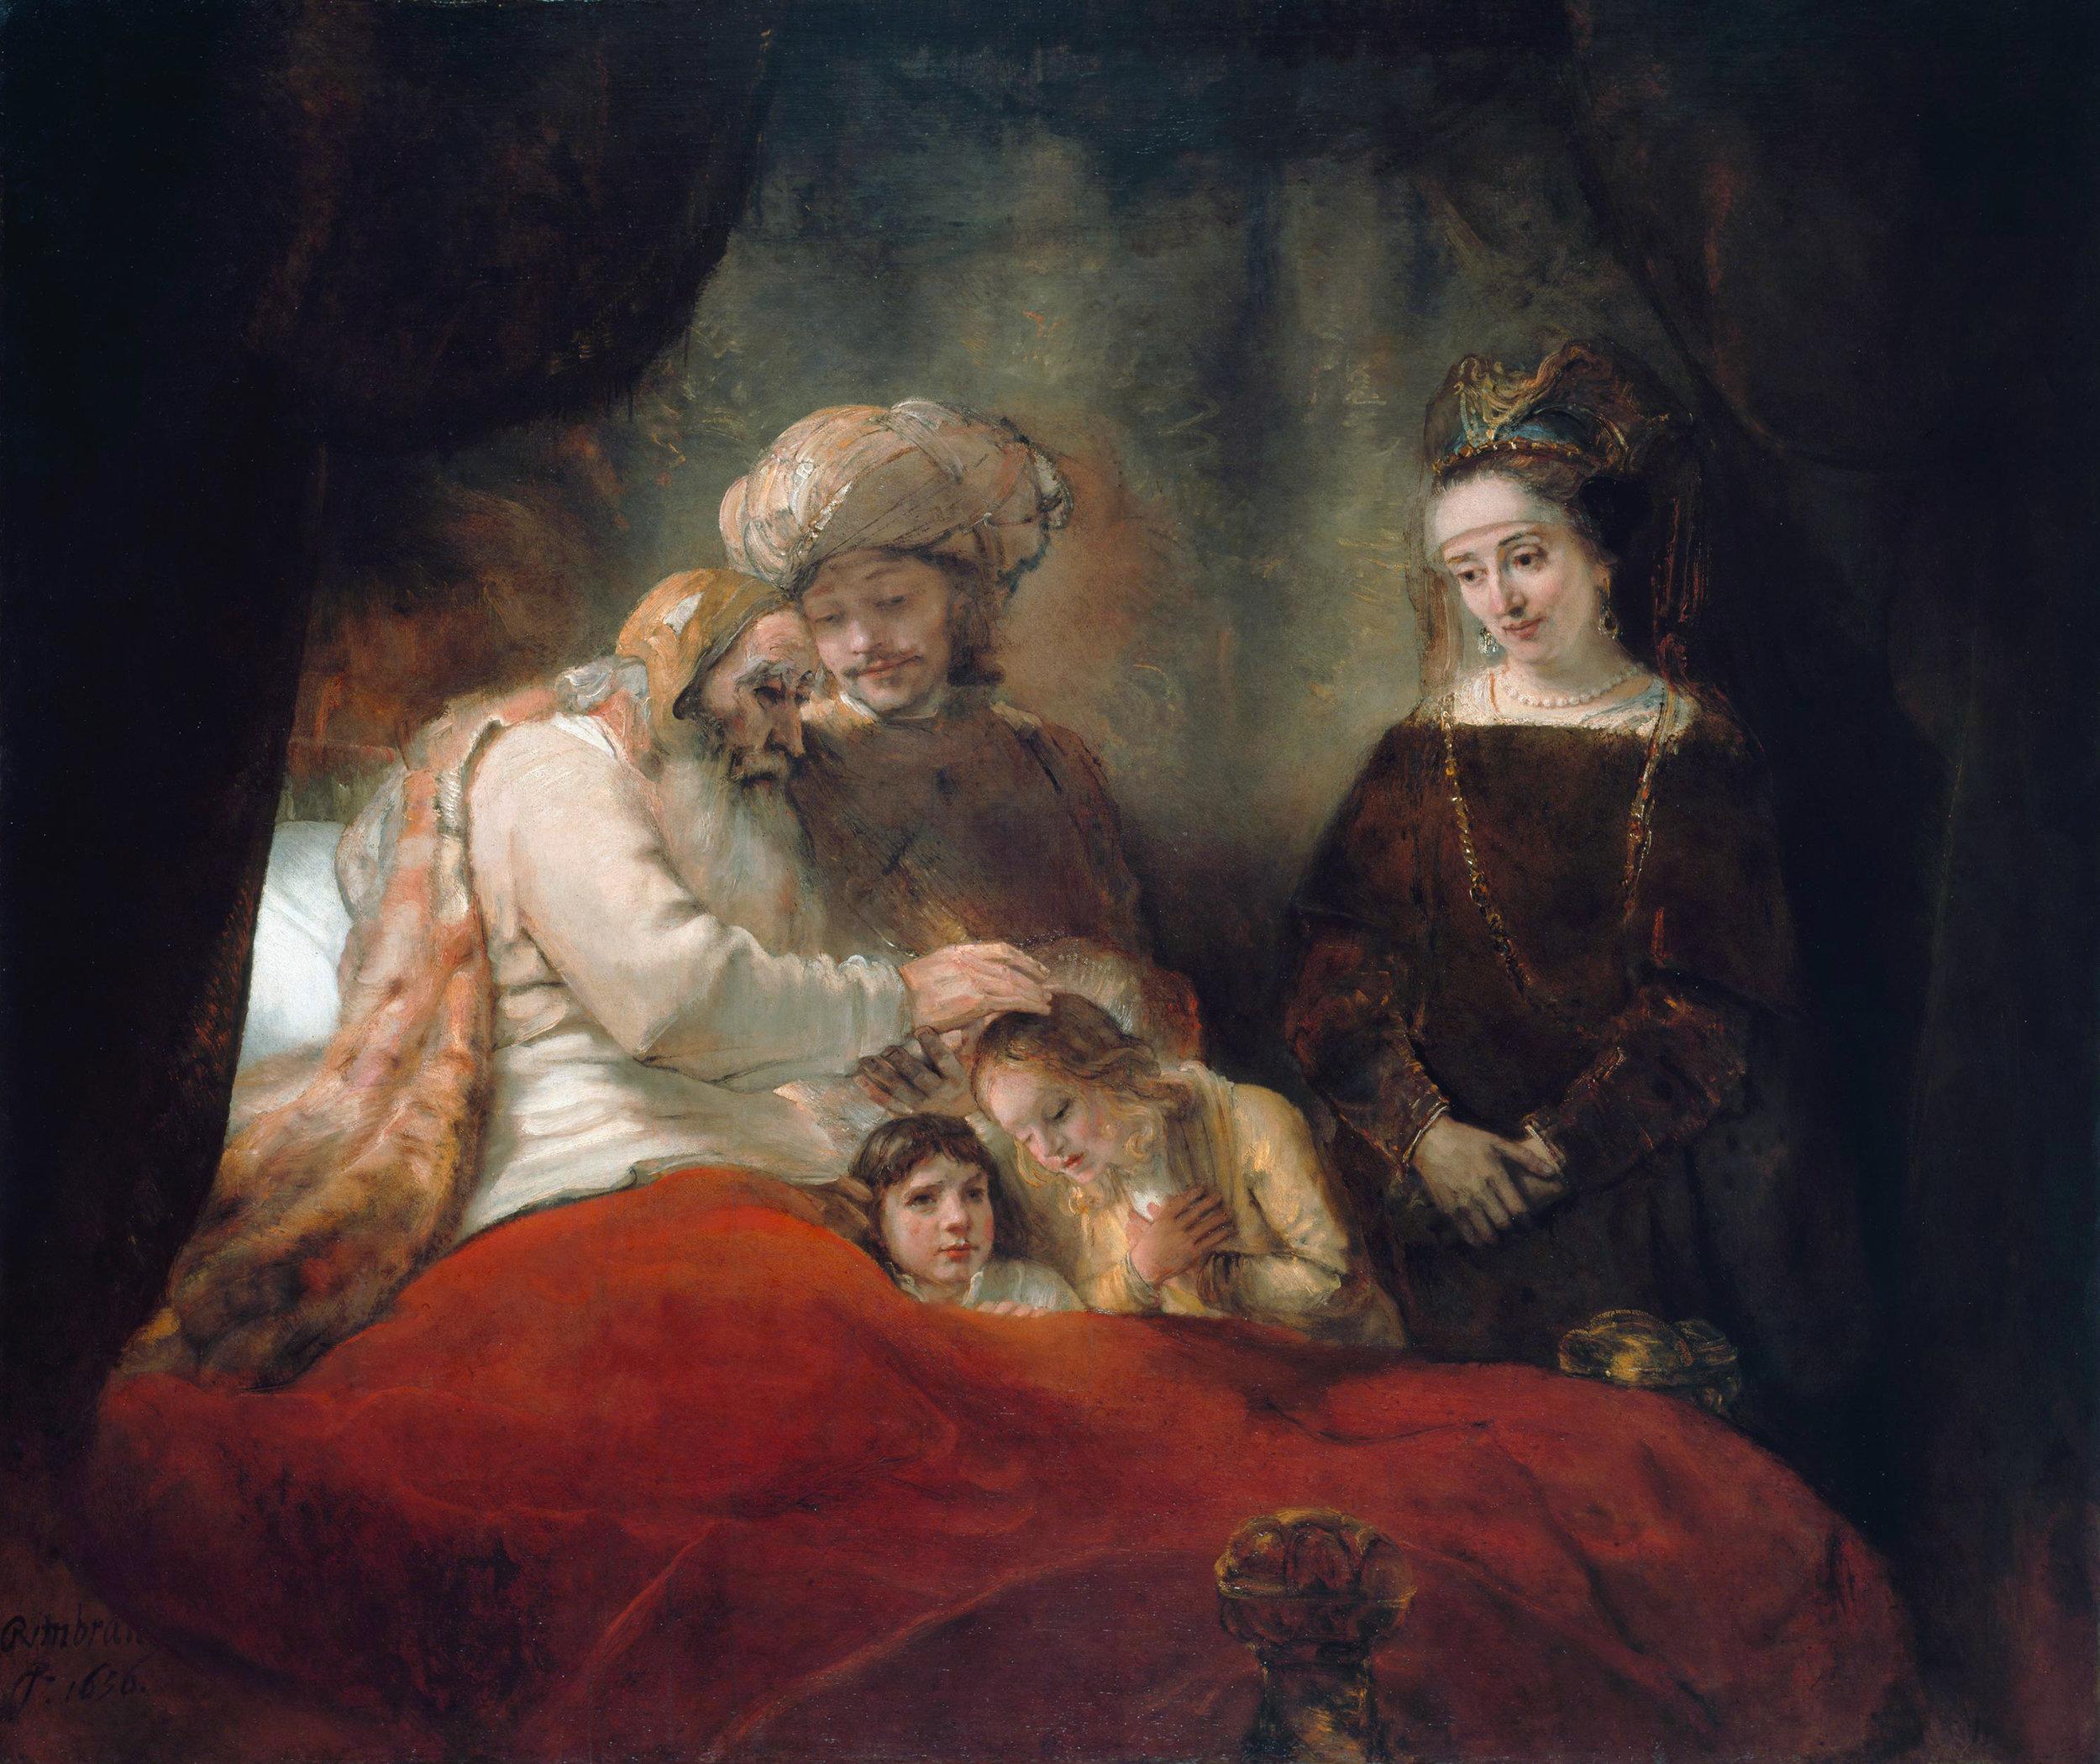 Rembrandt_-_Jacob_Blessing_the_Children_of_Joseph_-_WGA19117.jpg